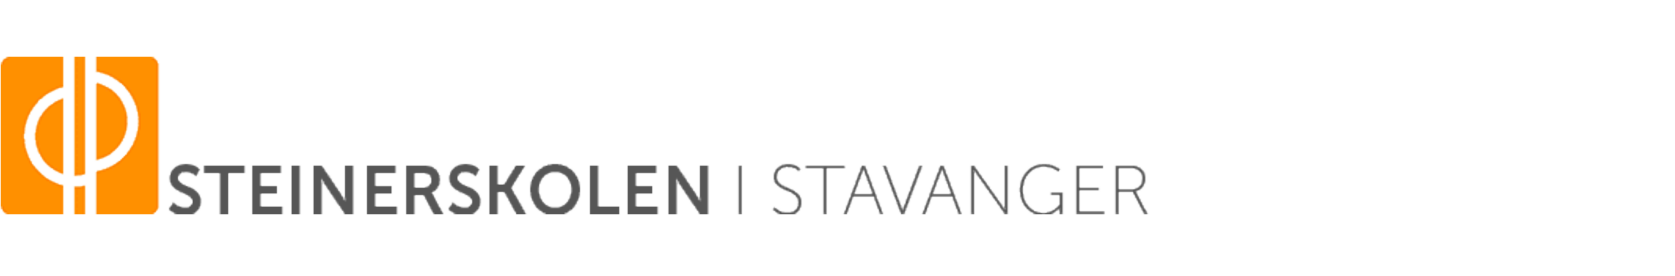 Steinerskolen i Stavanger